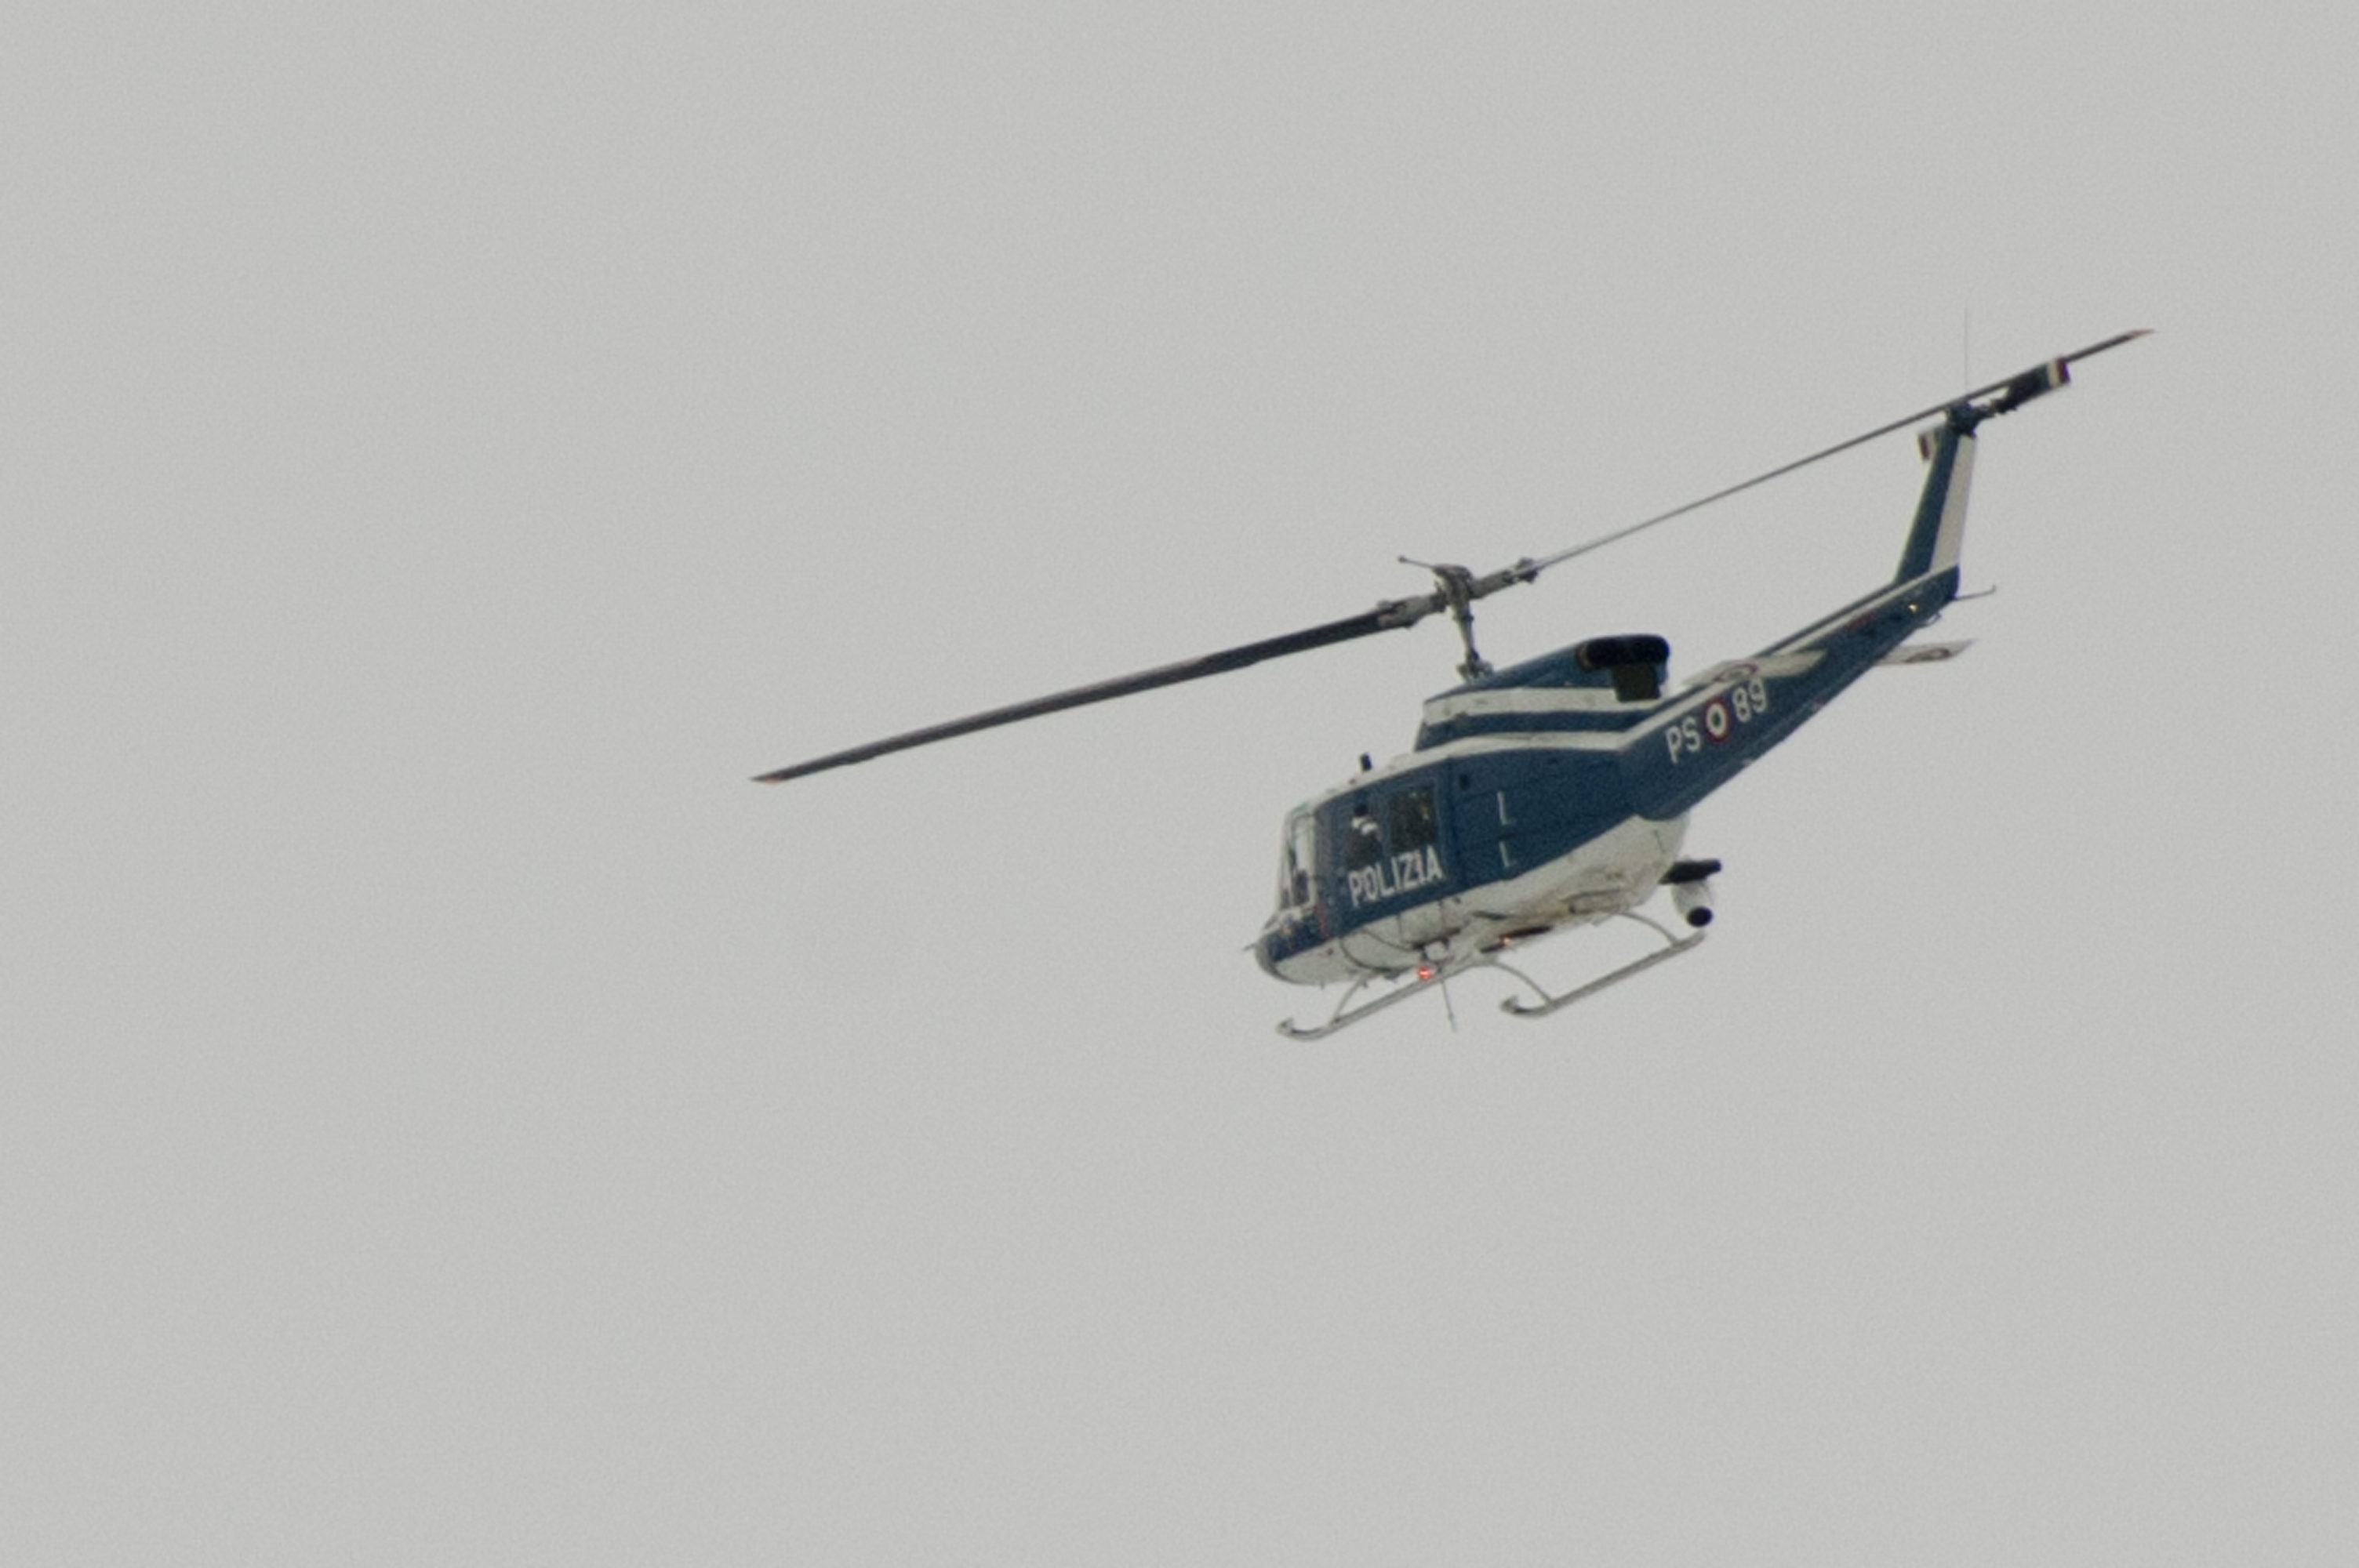 Elicottero Wikipedia : File elicottero polizia roma g wikimedia commons